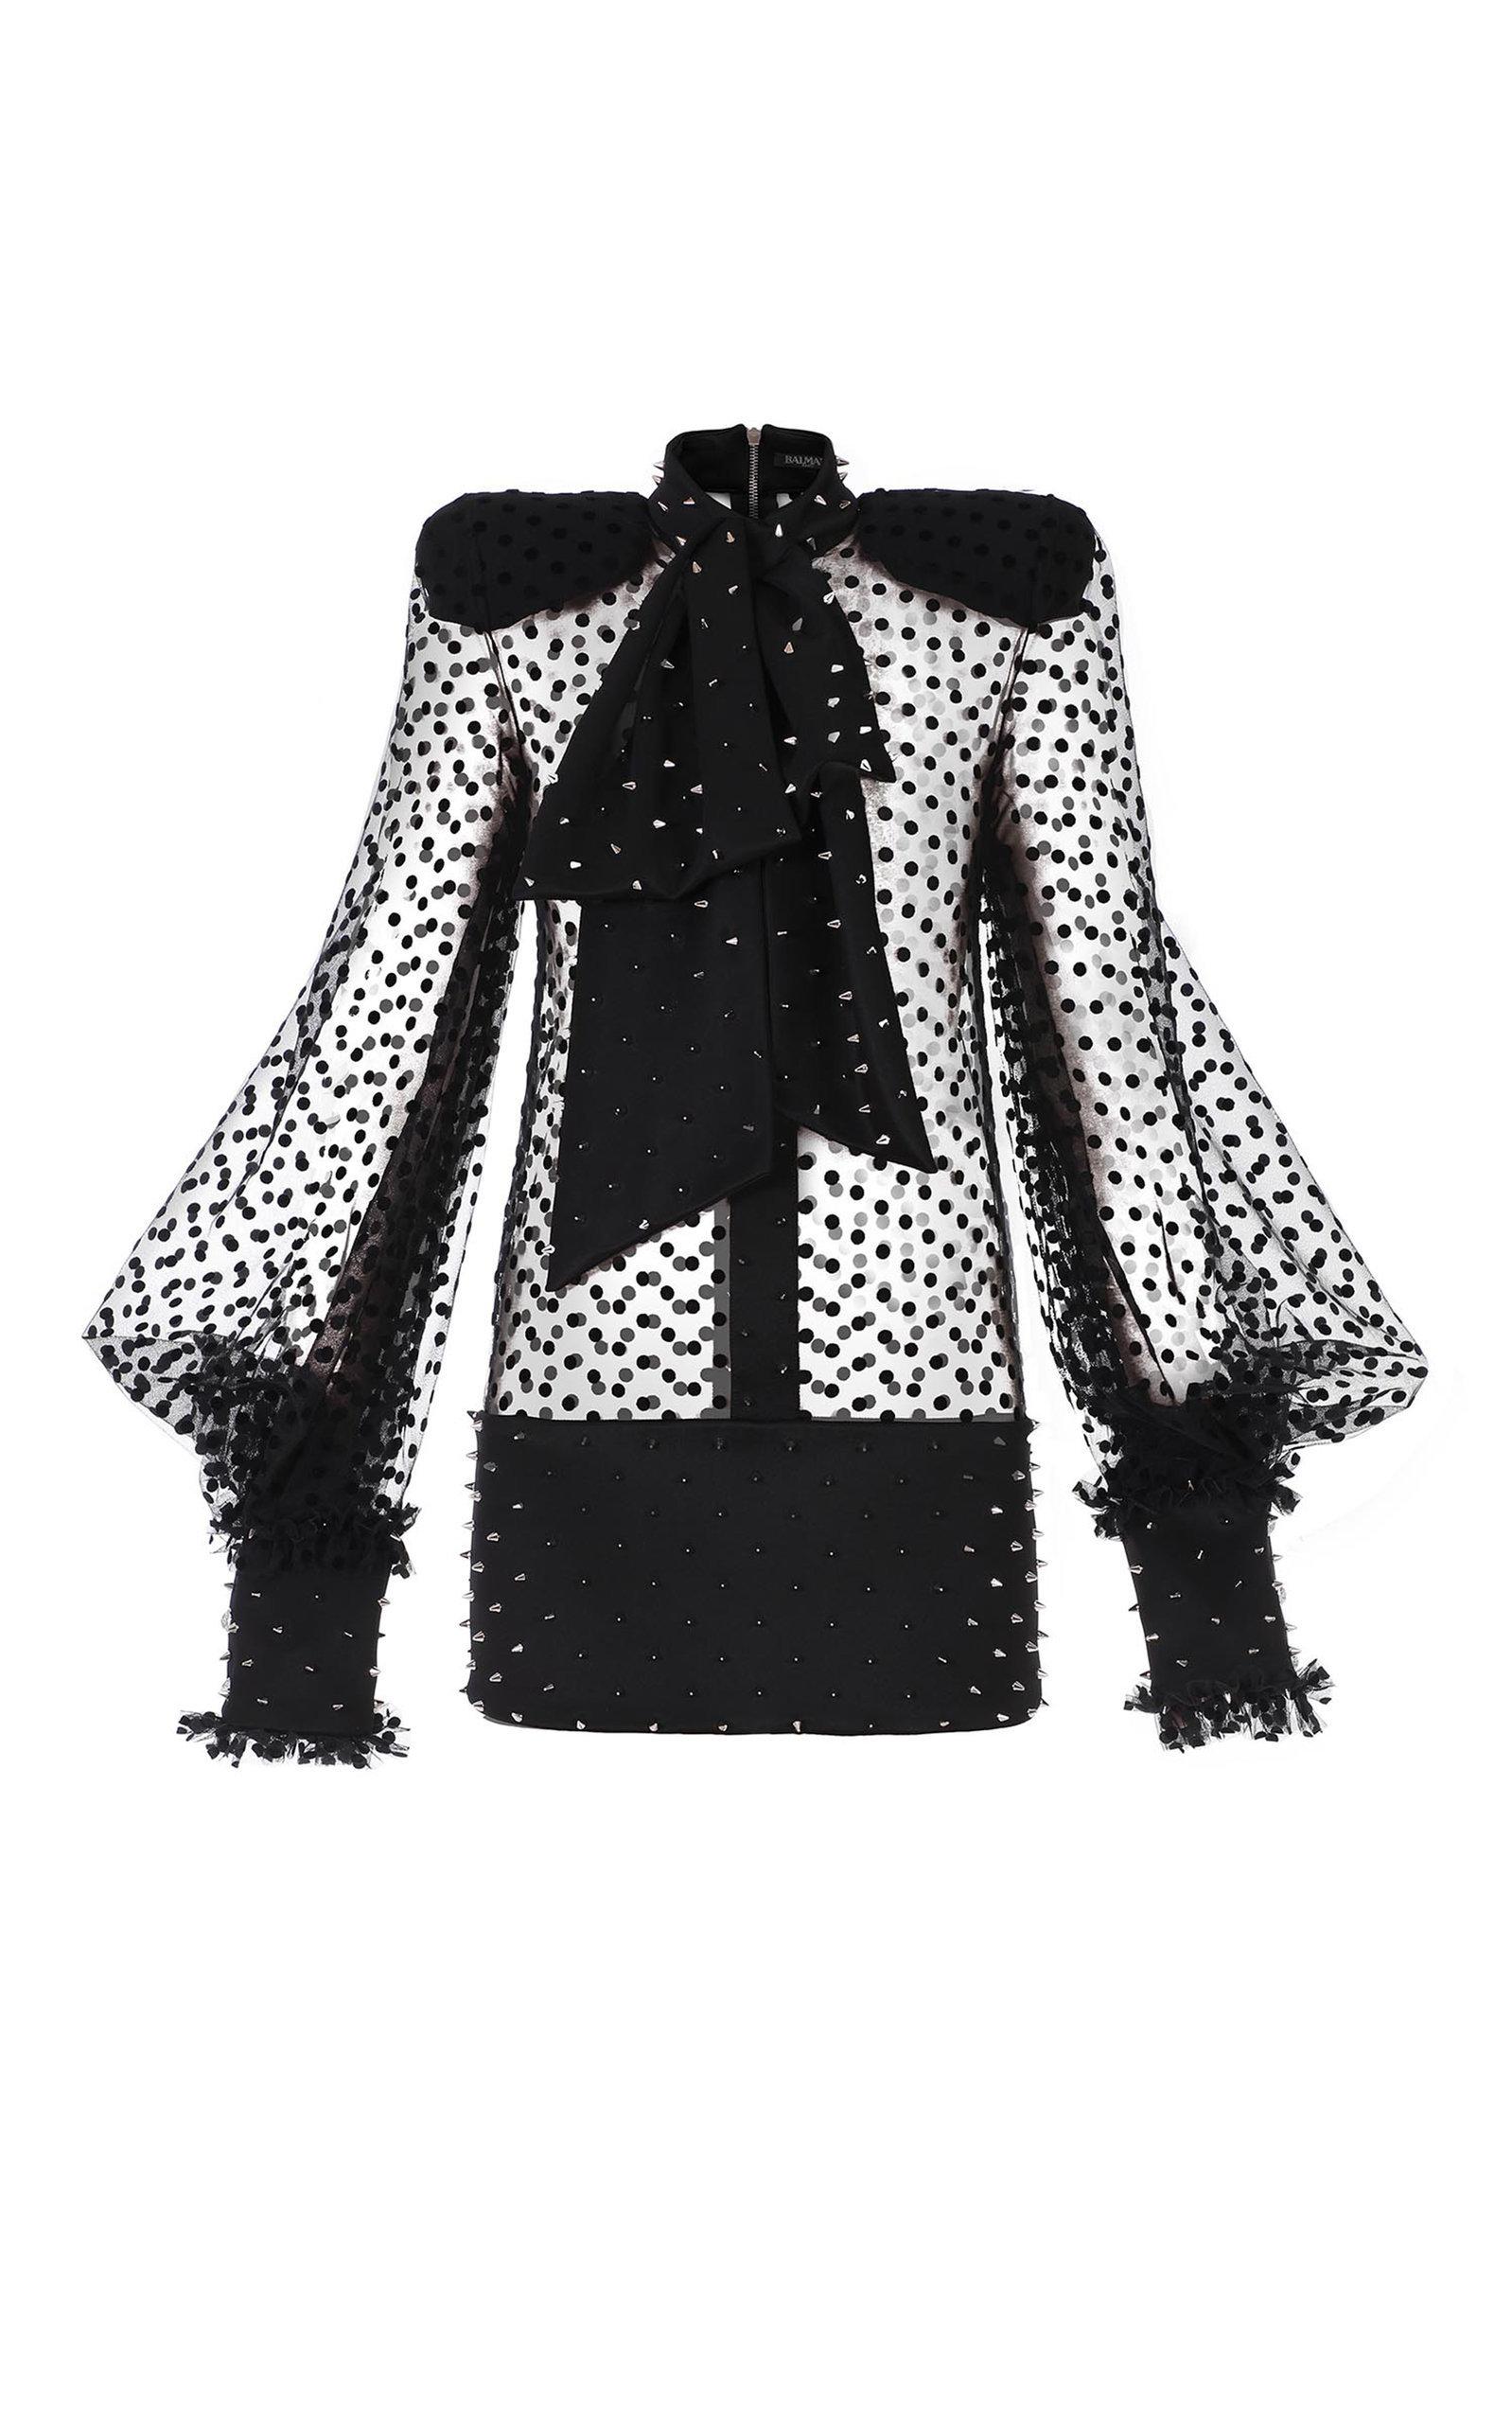 Bow-Embellished Spiked Swiss-Dot Mini Dress